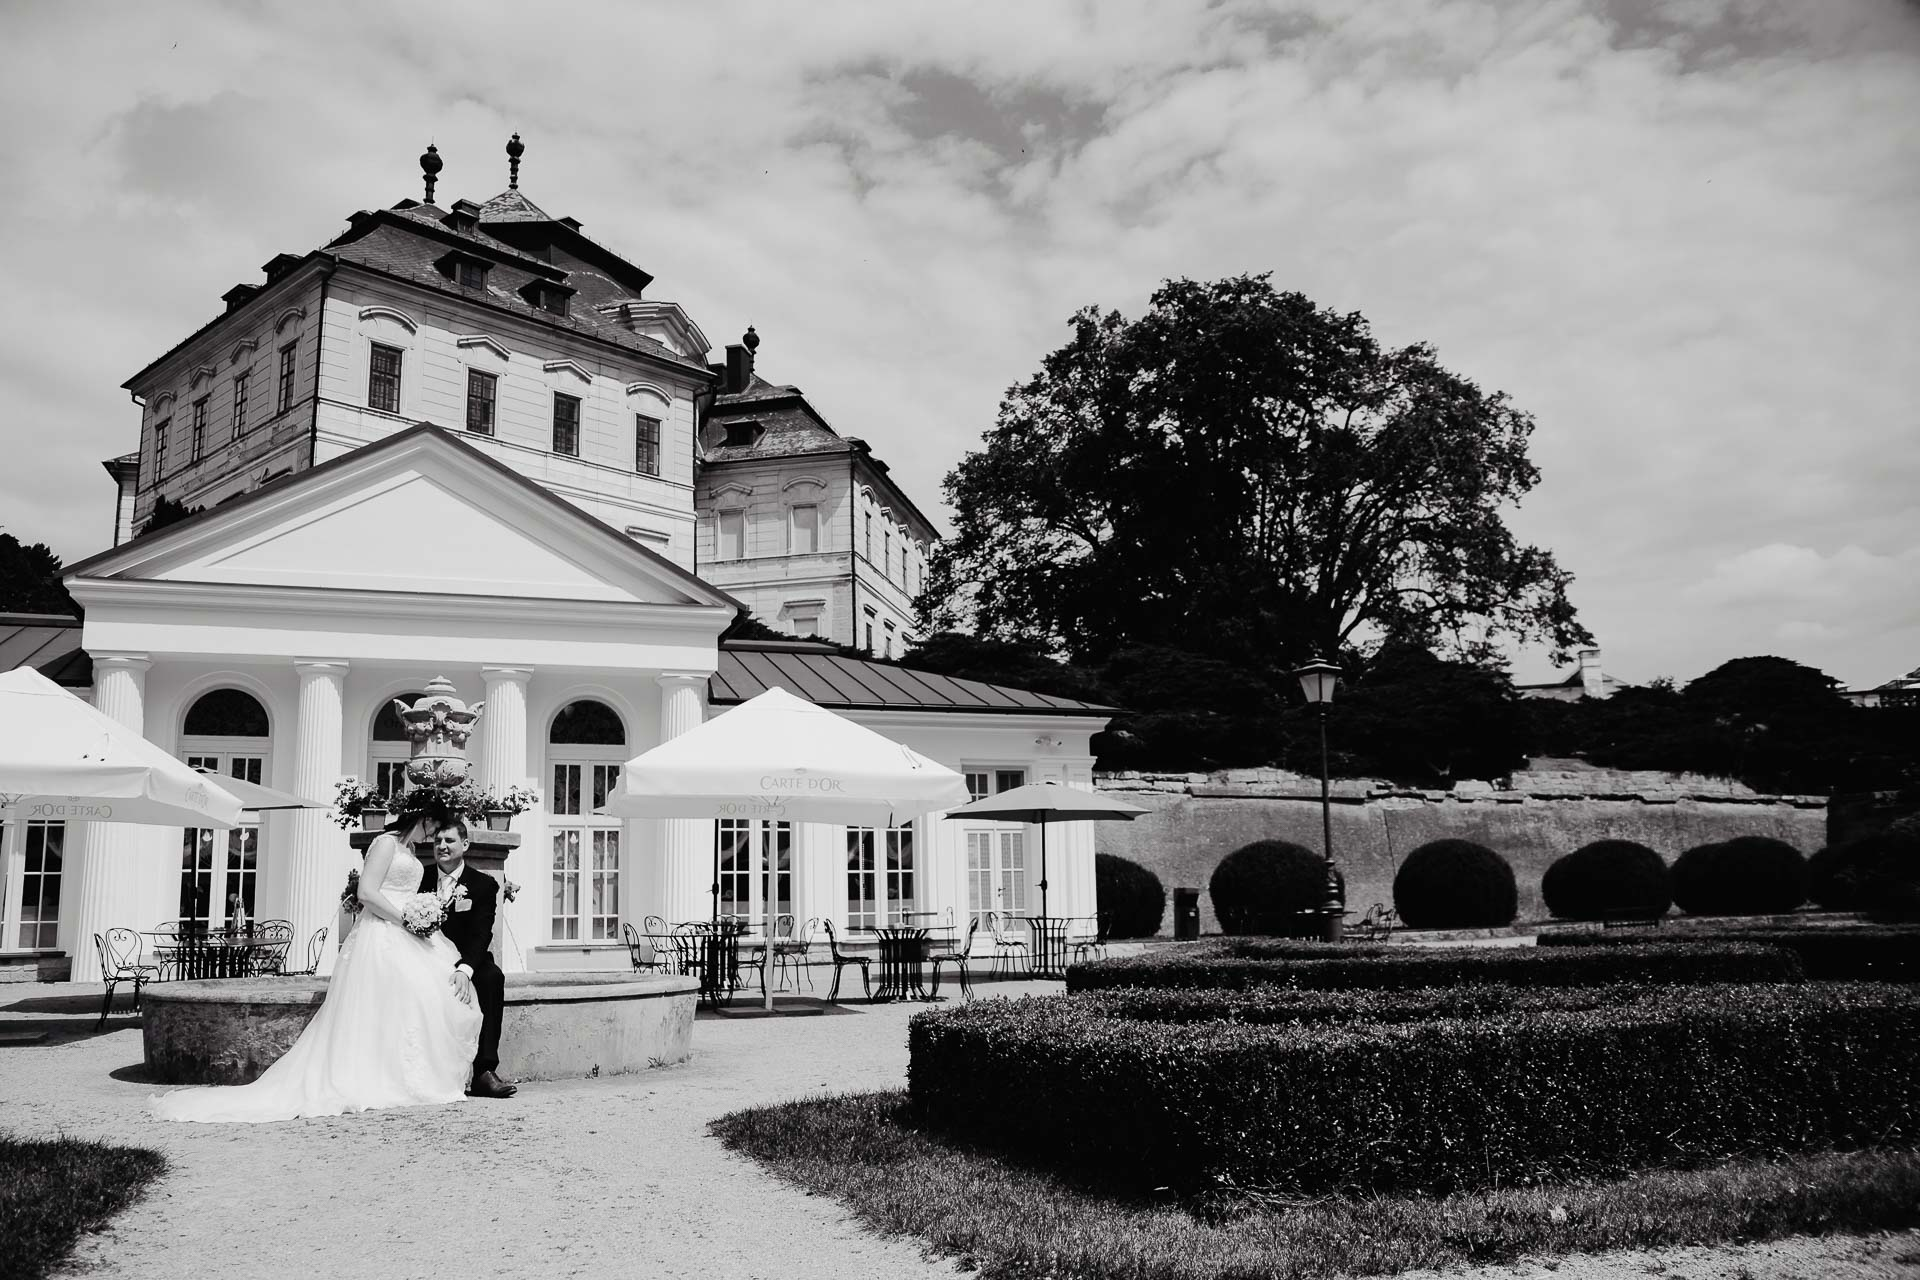 Svatební-fotograf-zámek-Karlova-Koruna-Chlumec-nad-Cidlinou-161